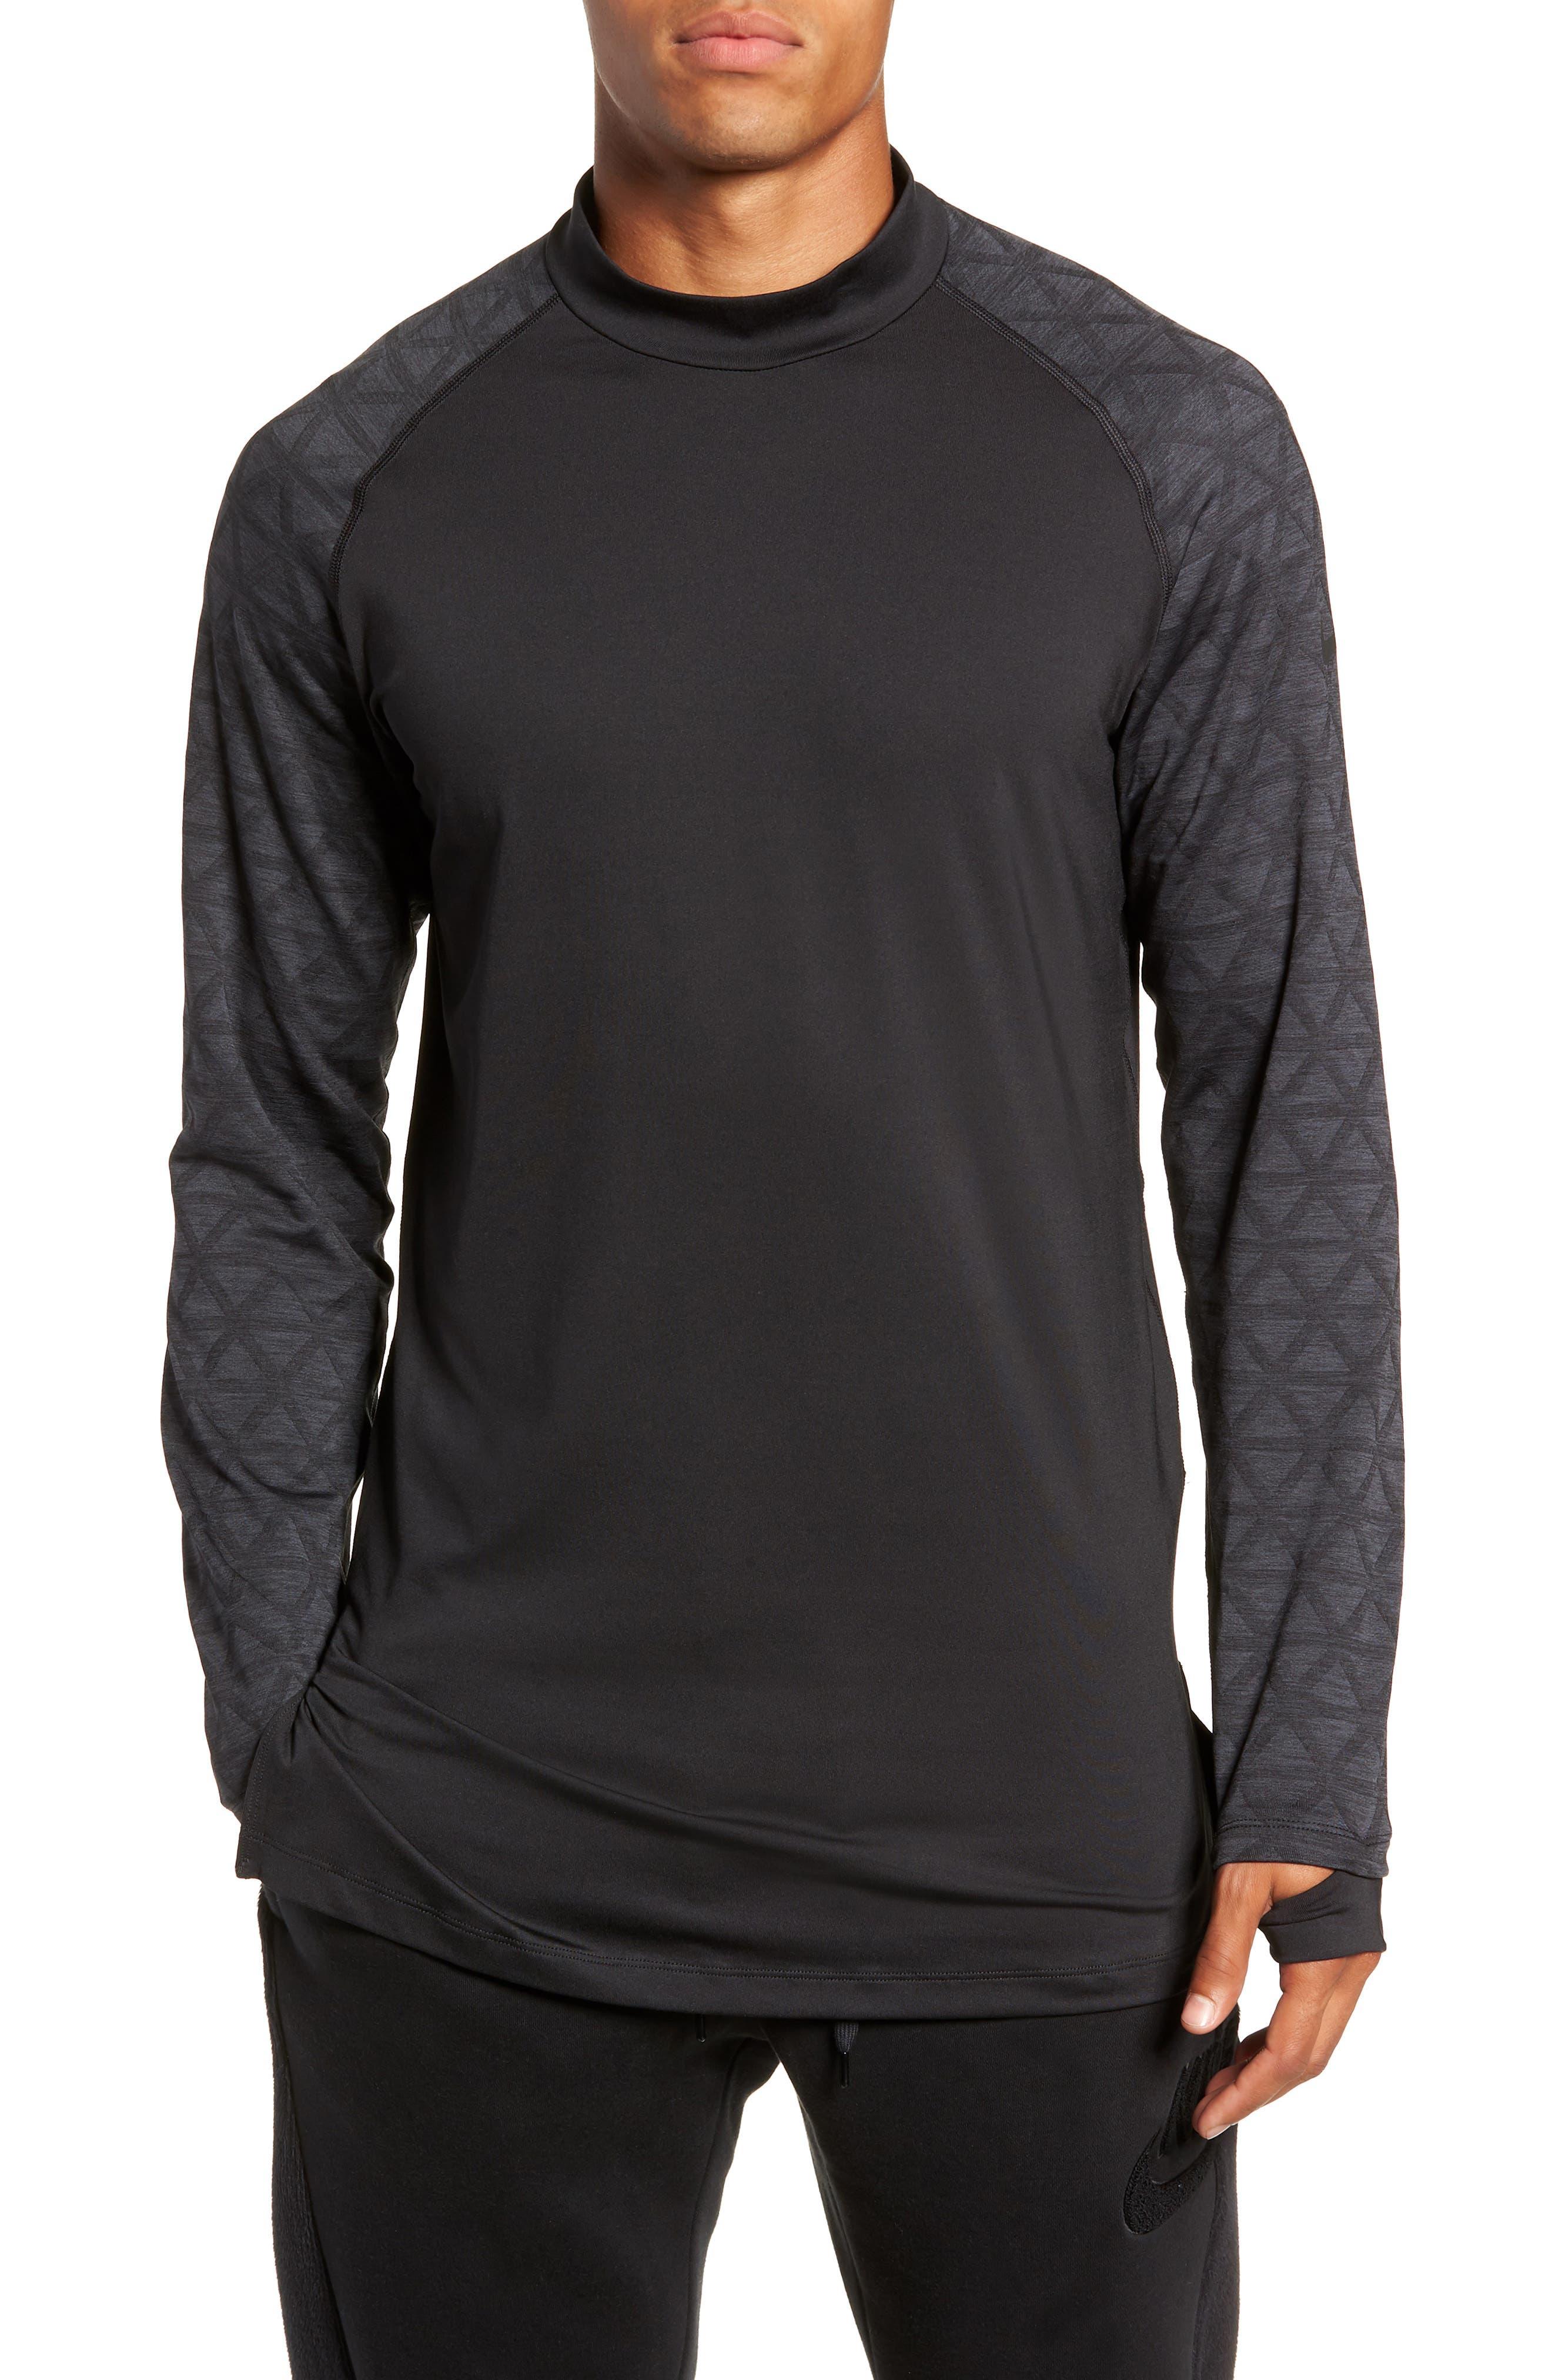 NIKE,                             Niko Pro Therma Long Sleeve Mock Neck T-Shirt,                             Main thumbnail 1, color,                             010